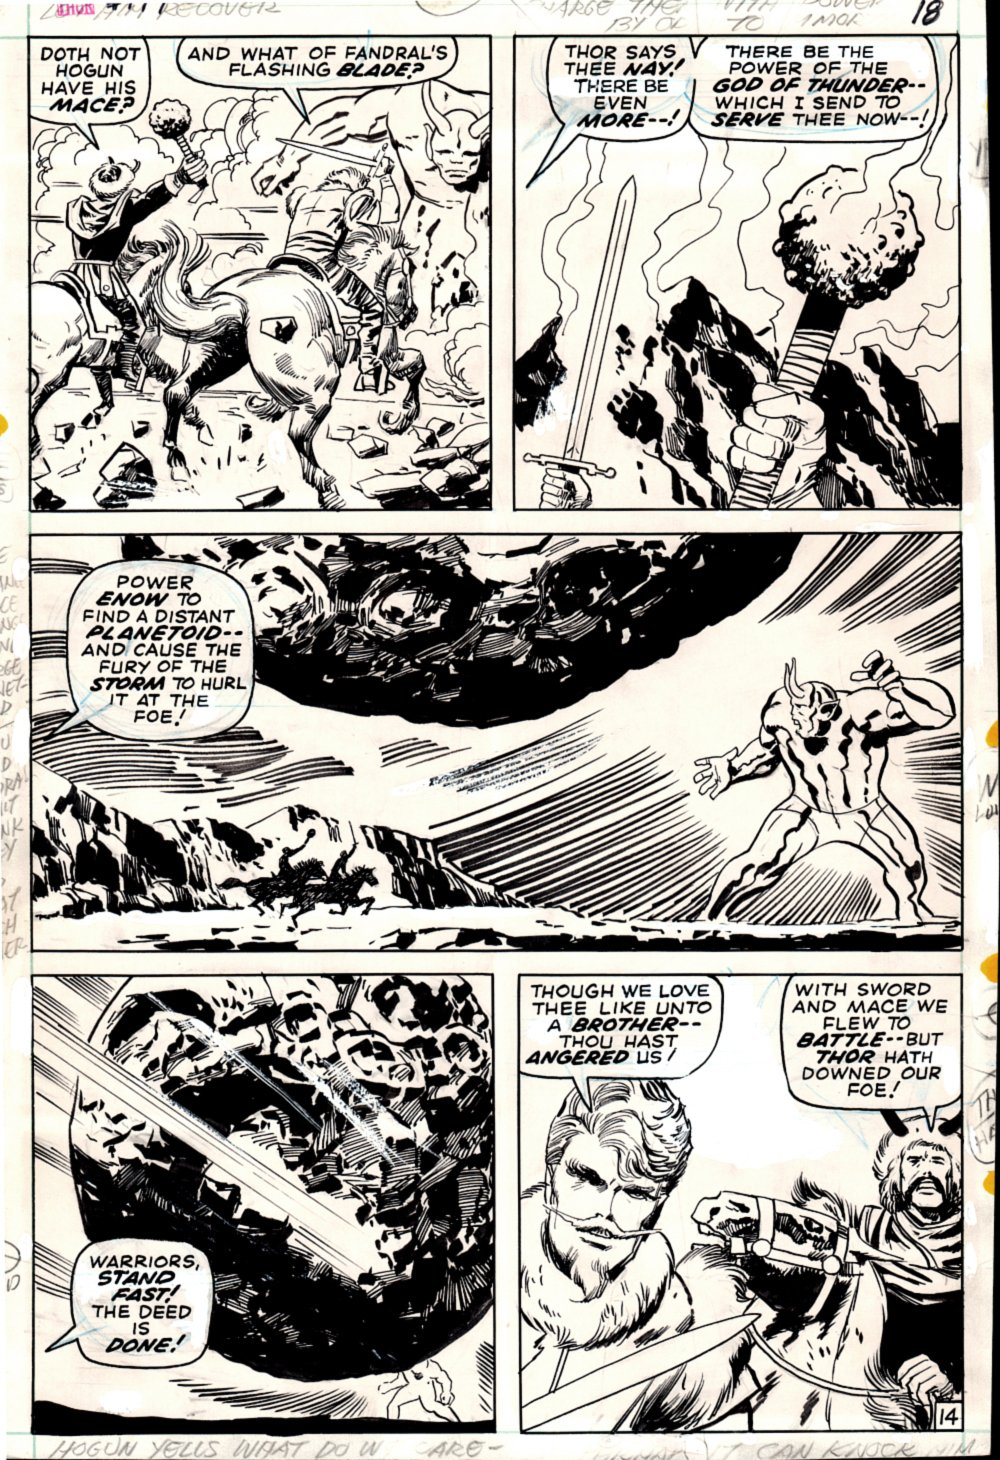 Thor #177 p 14 (Fandral & Hogun Battling The Monstrous TOAG!) 1970